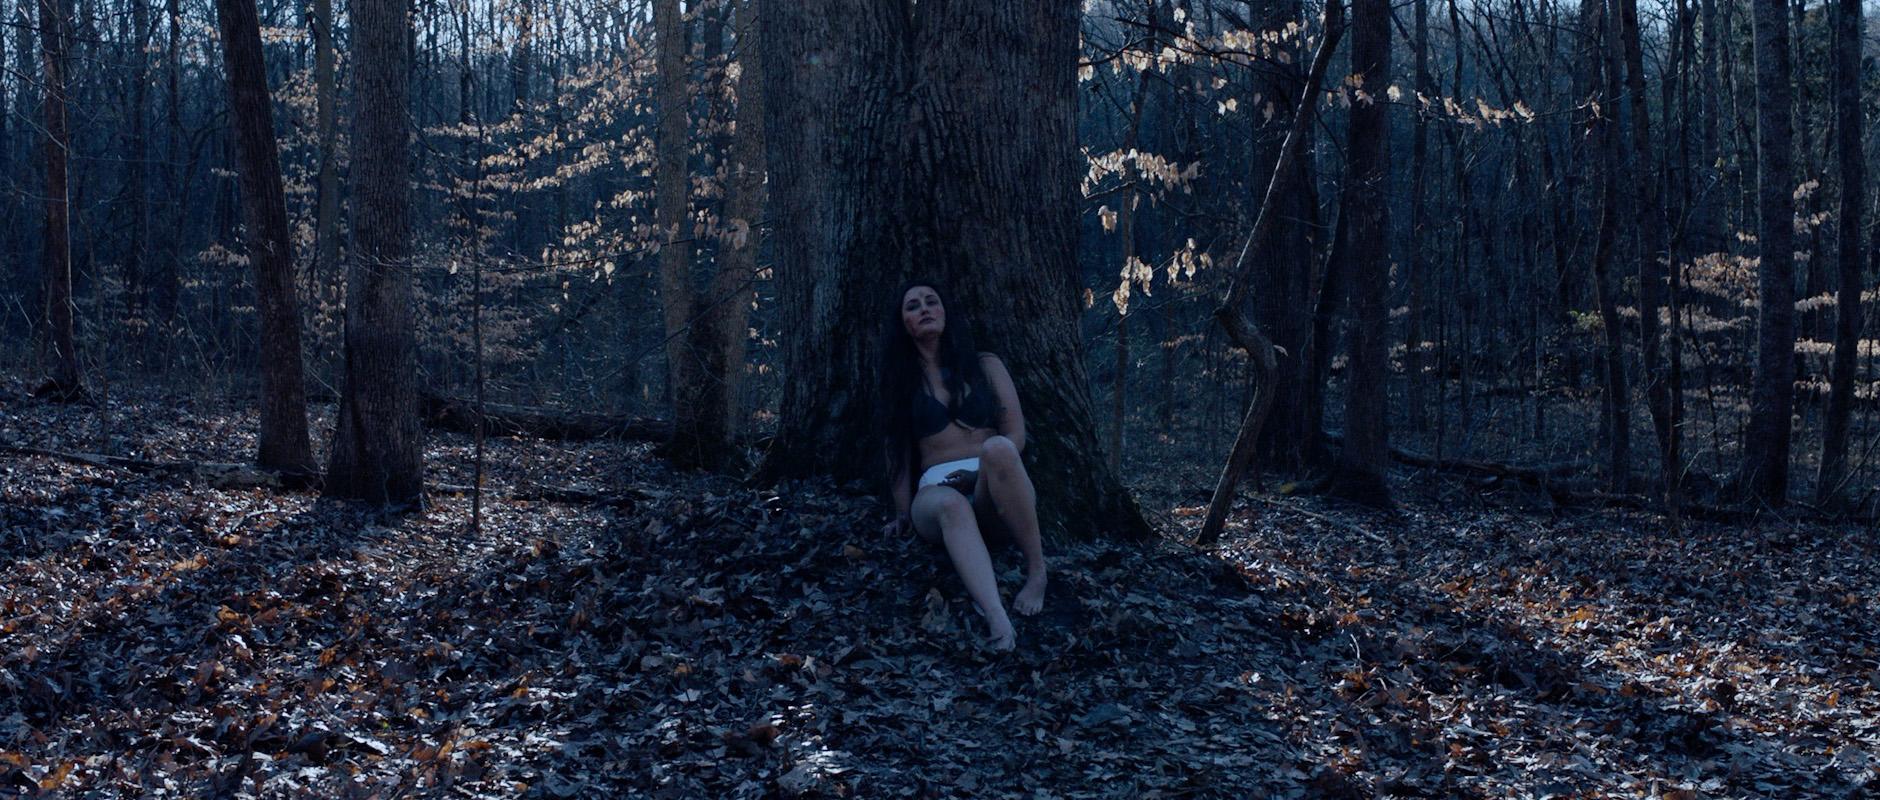 Bones - A short film by Matthew Underwood